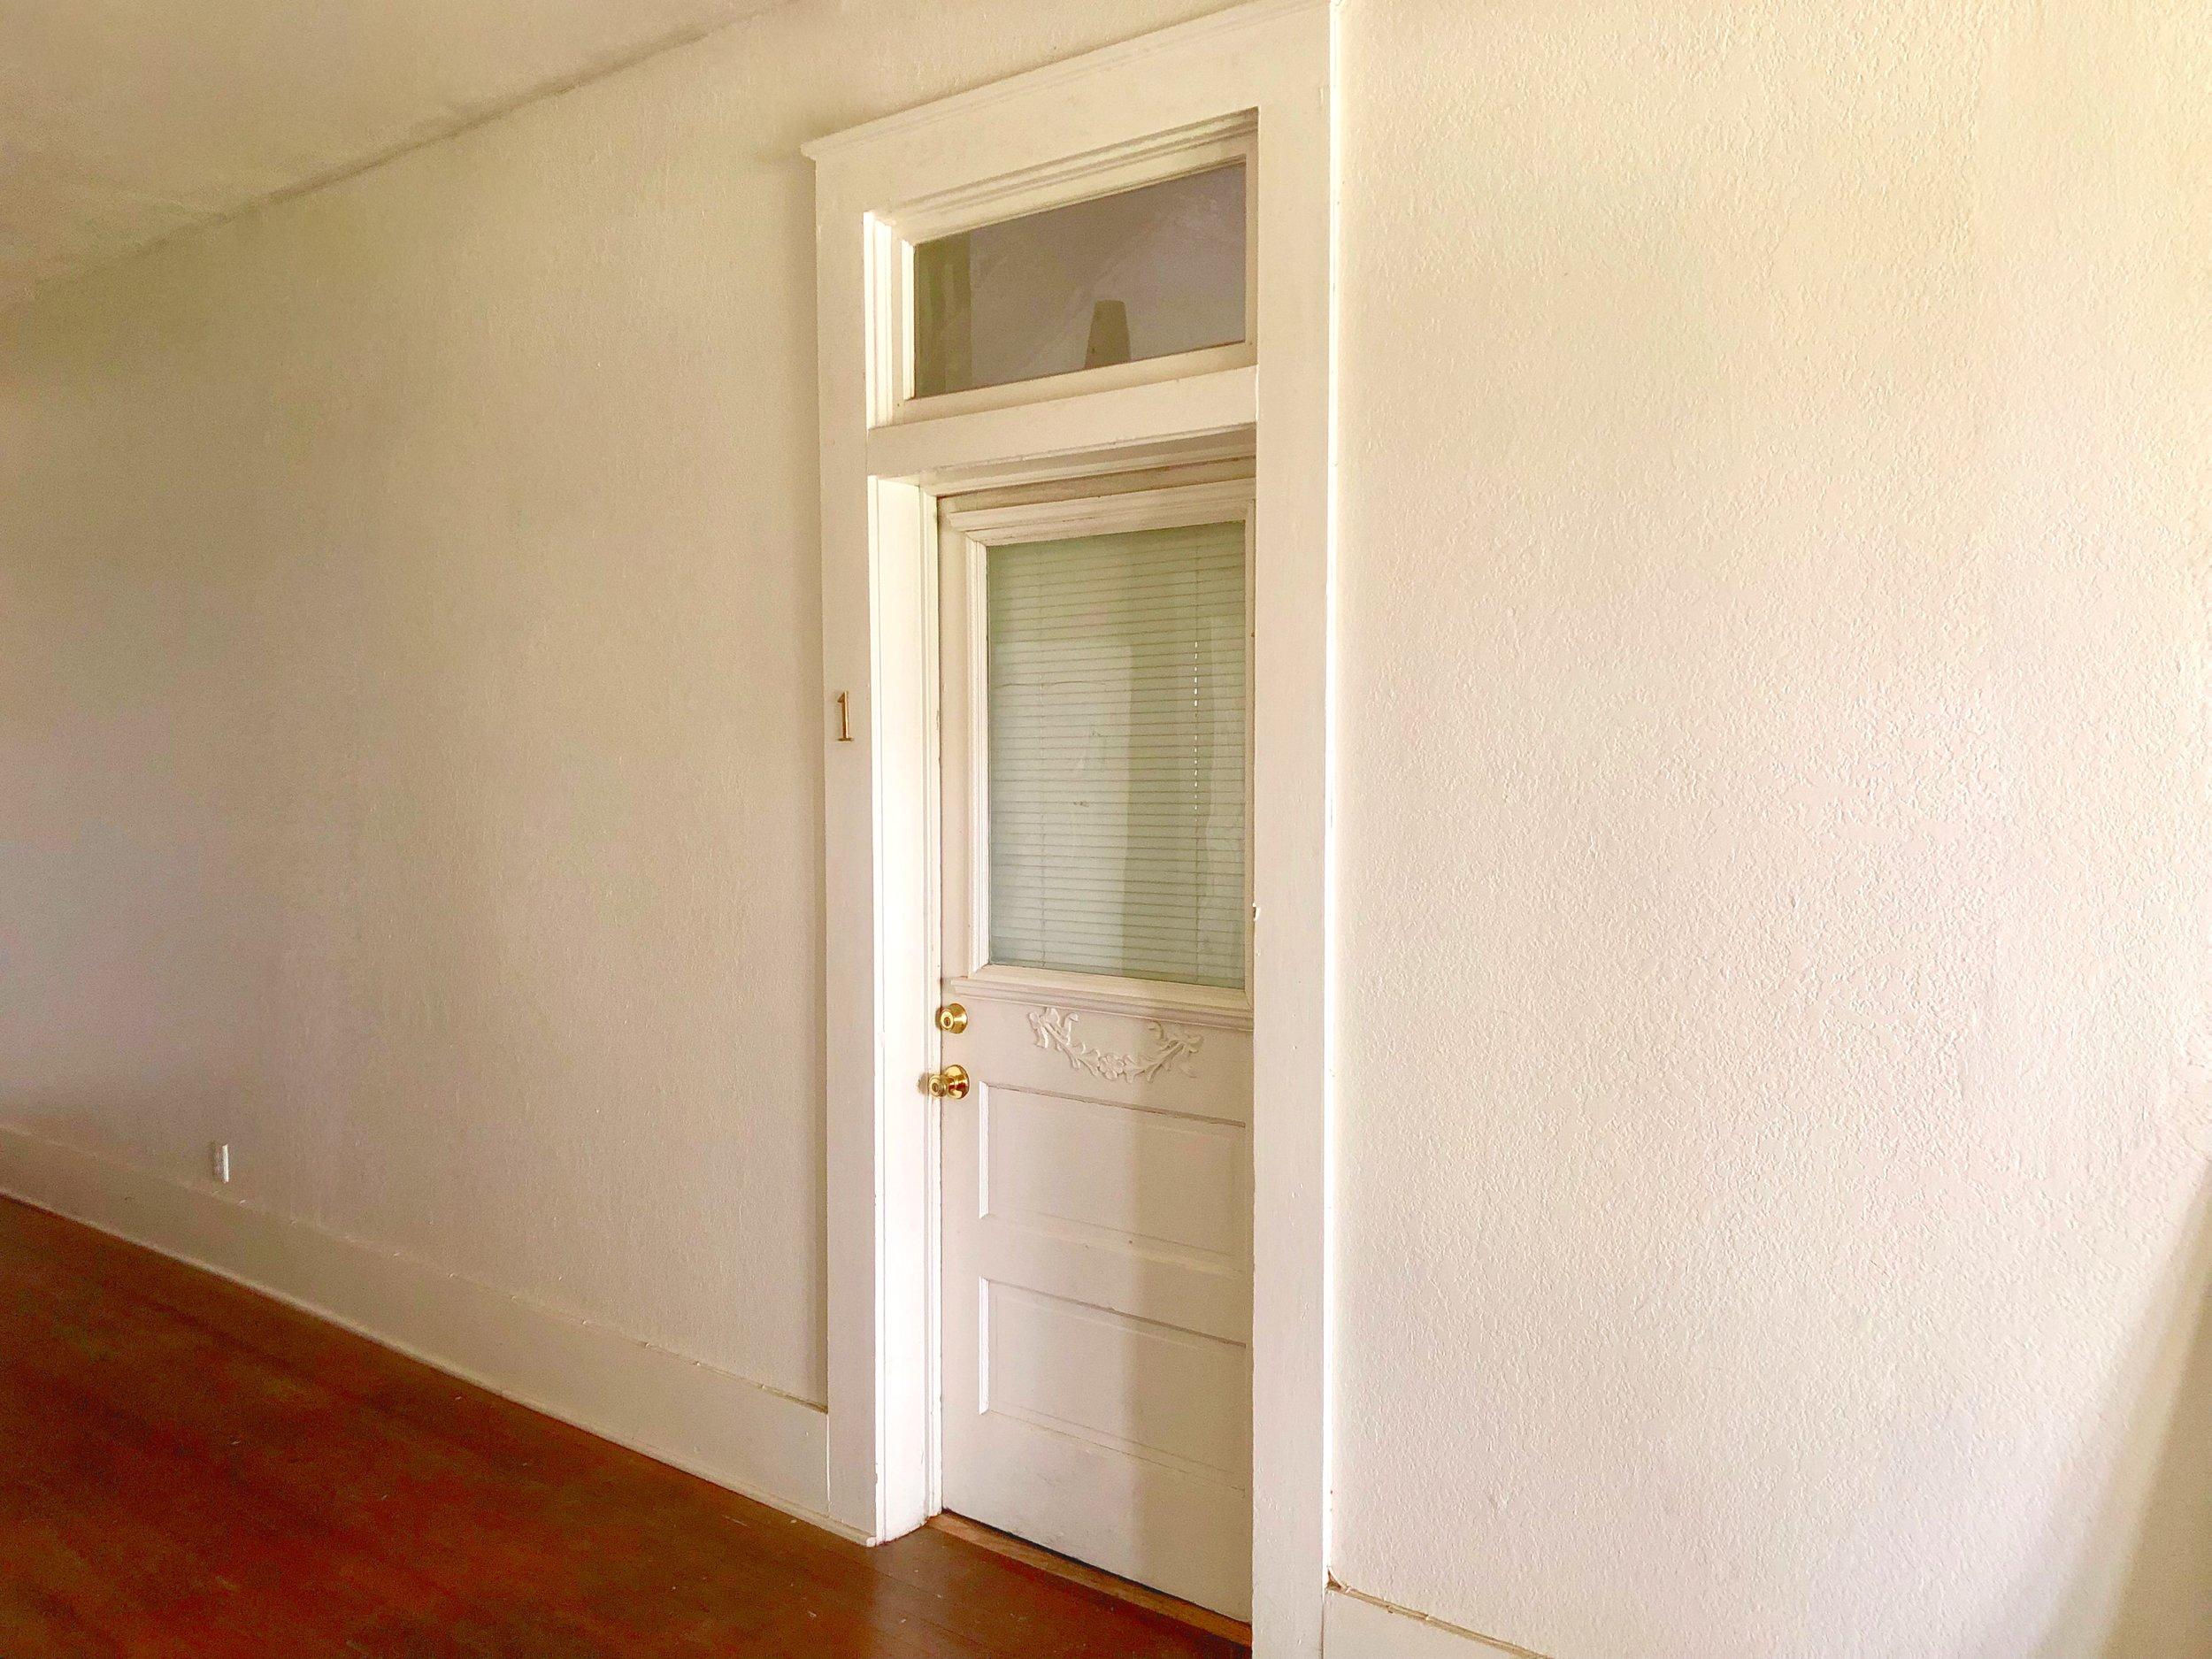 Apt #1 - Inside front door entrance